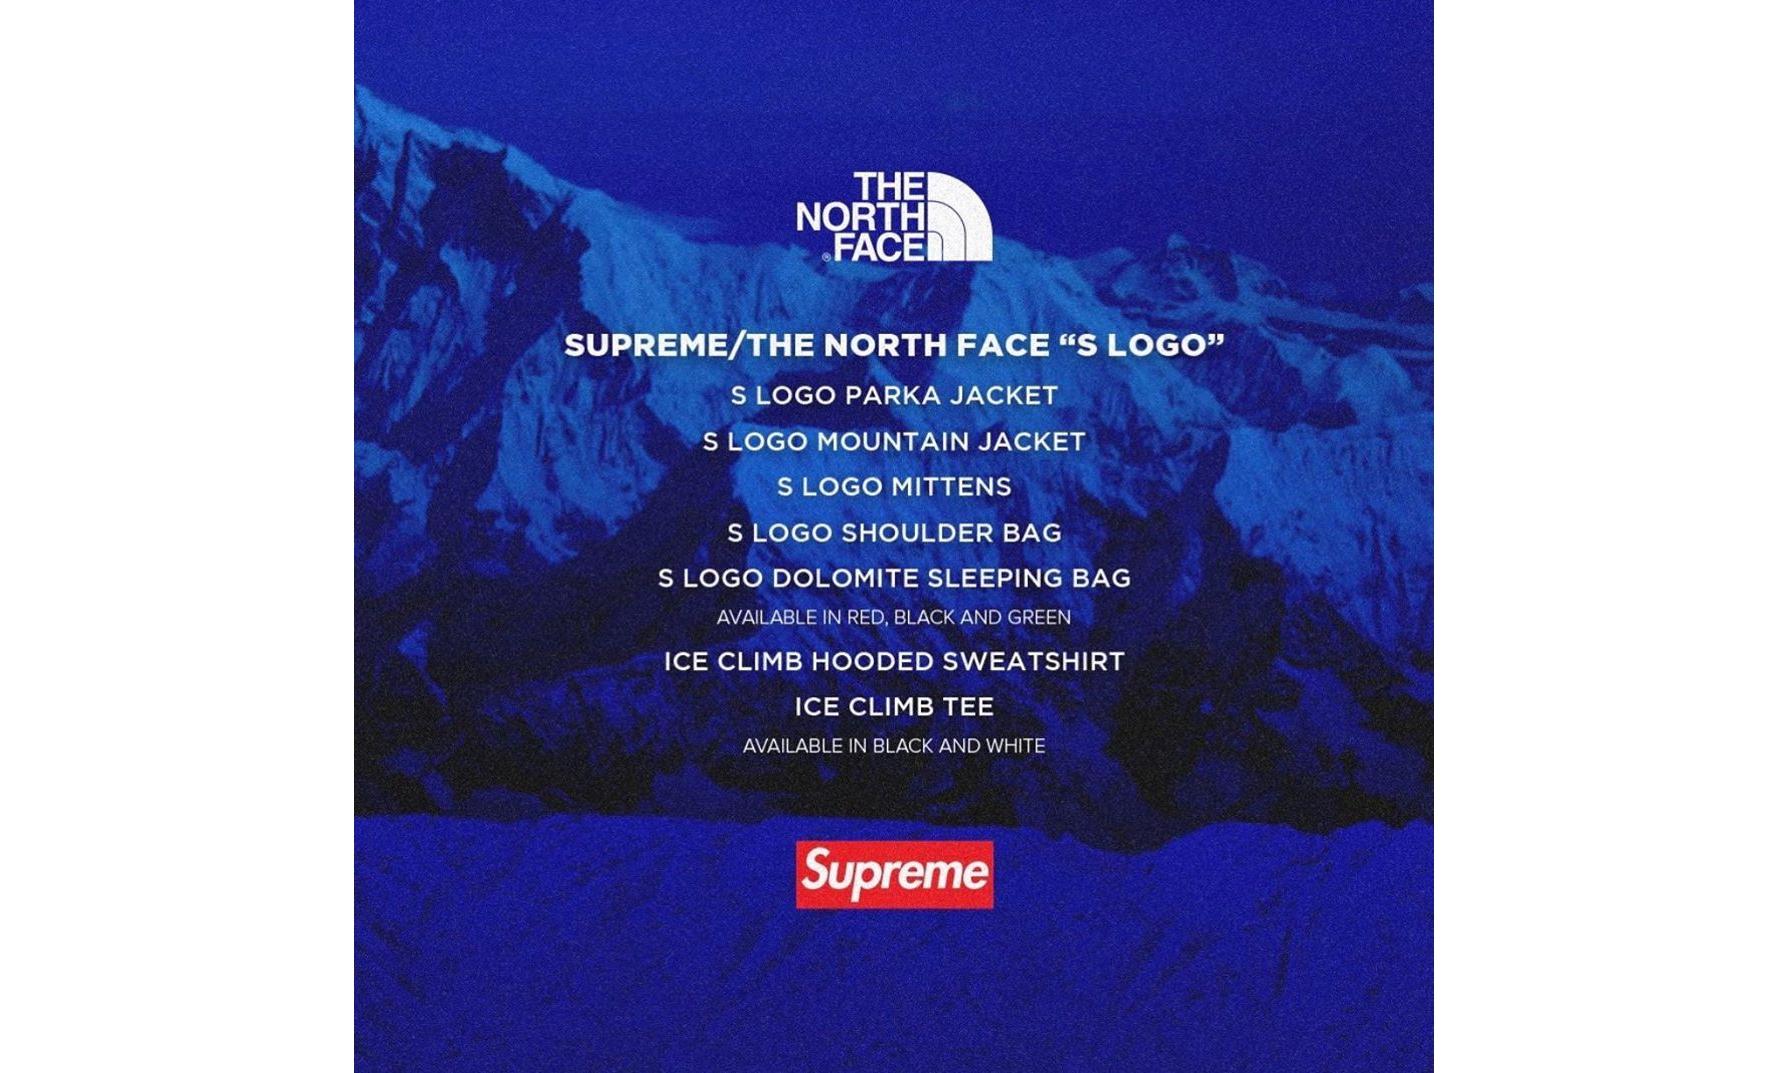 Supreme 将合作 THE NORTH FACE 推出「S」logo 联乘系列